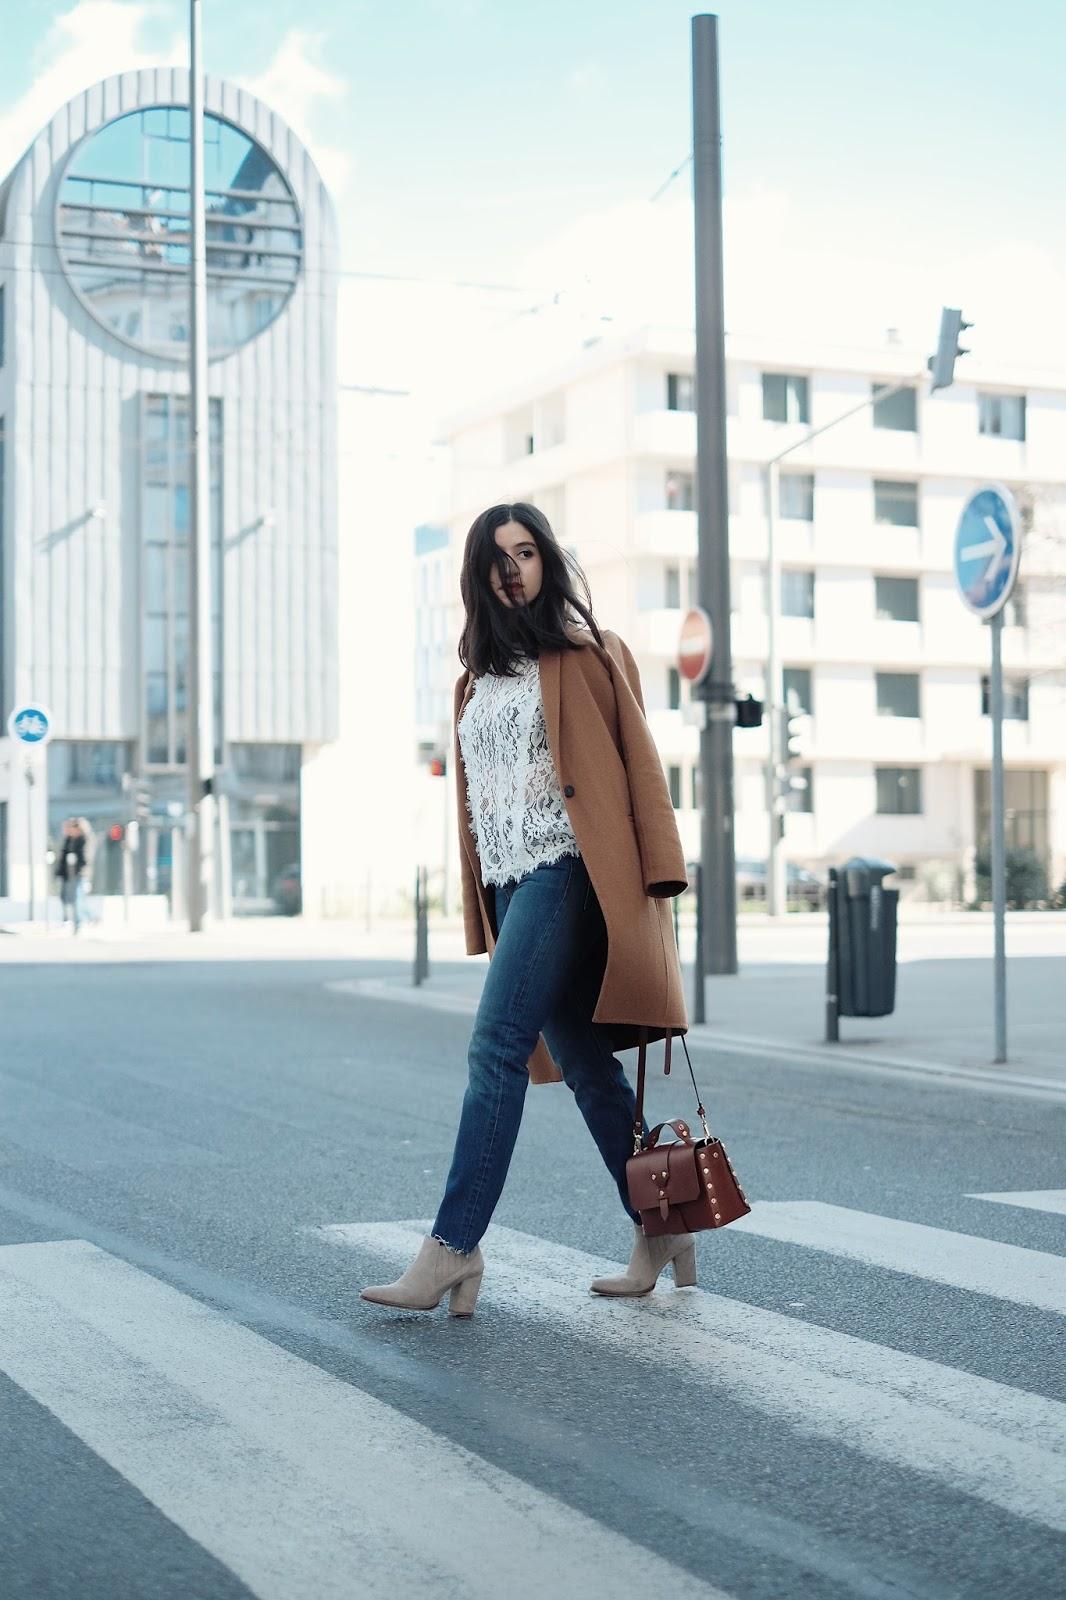 ameni daily, blog mode lyon, blog mode, amenidaily, blogueuse lyonnaise, comptoir des cotonniers, grace&mila, grace and mila, streetstyle, french blogger, blogueuse mode